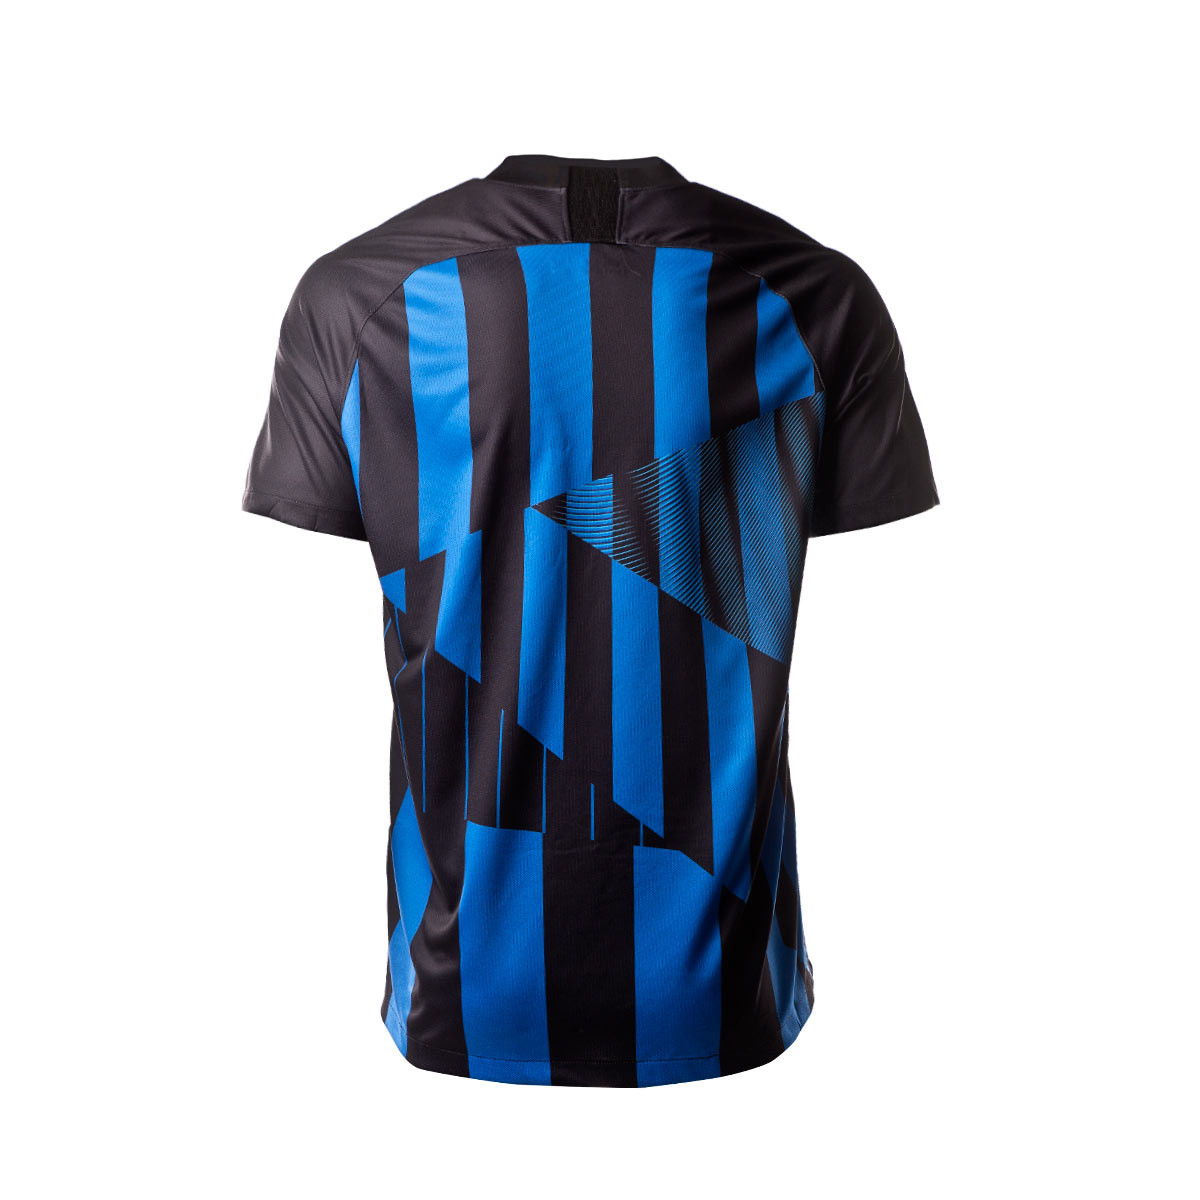 a5867d680ae Jersey Nike Inter Milan Stadium 20th Anniversary 2018-2019 Black-Royal  blue-White - Tienda de fútbol Fútbol Emotion